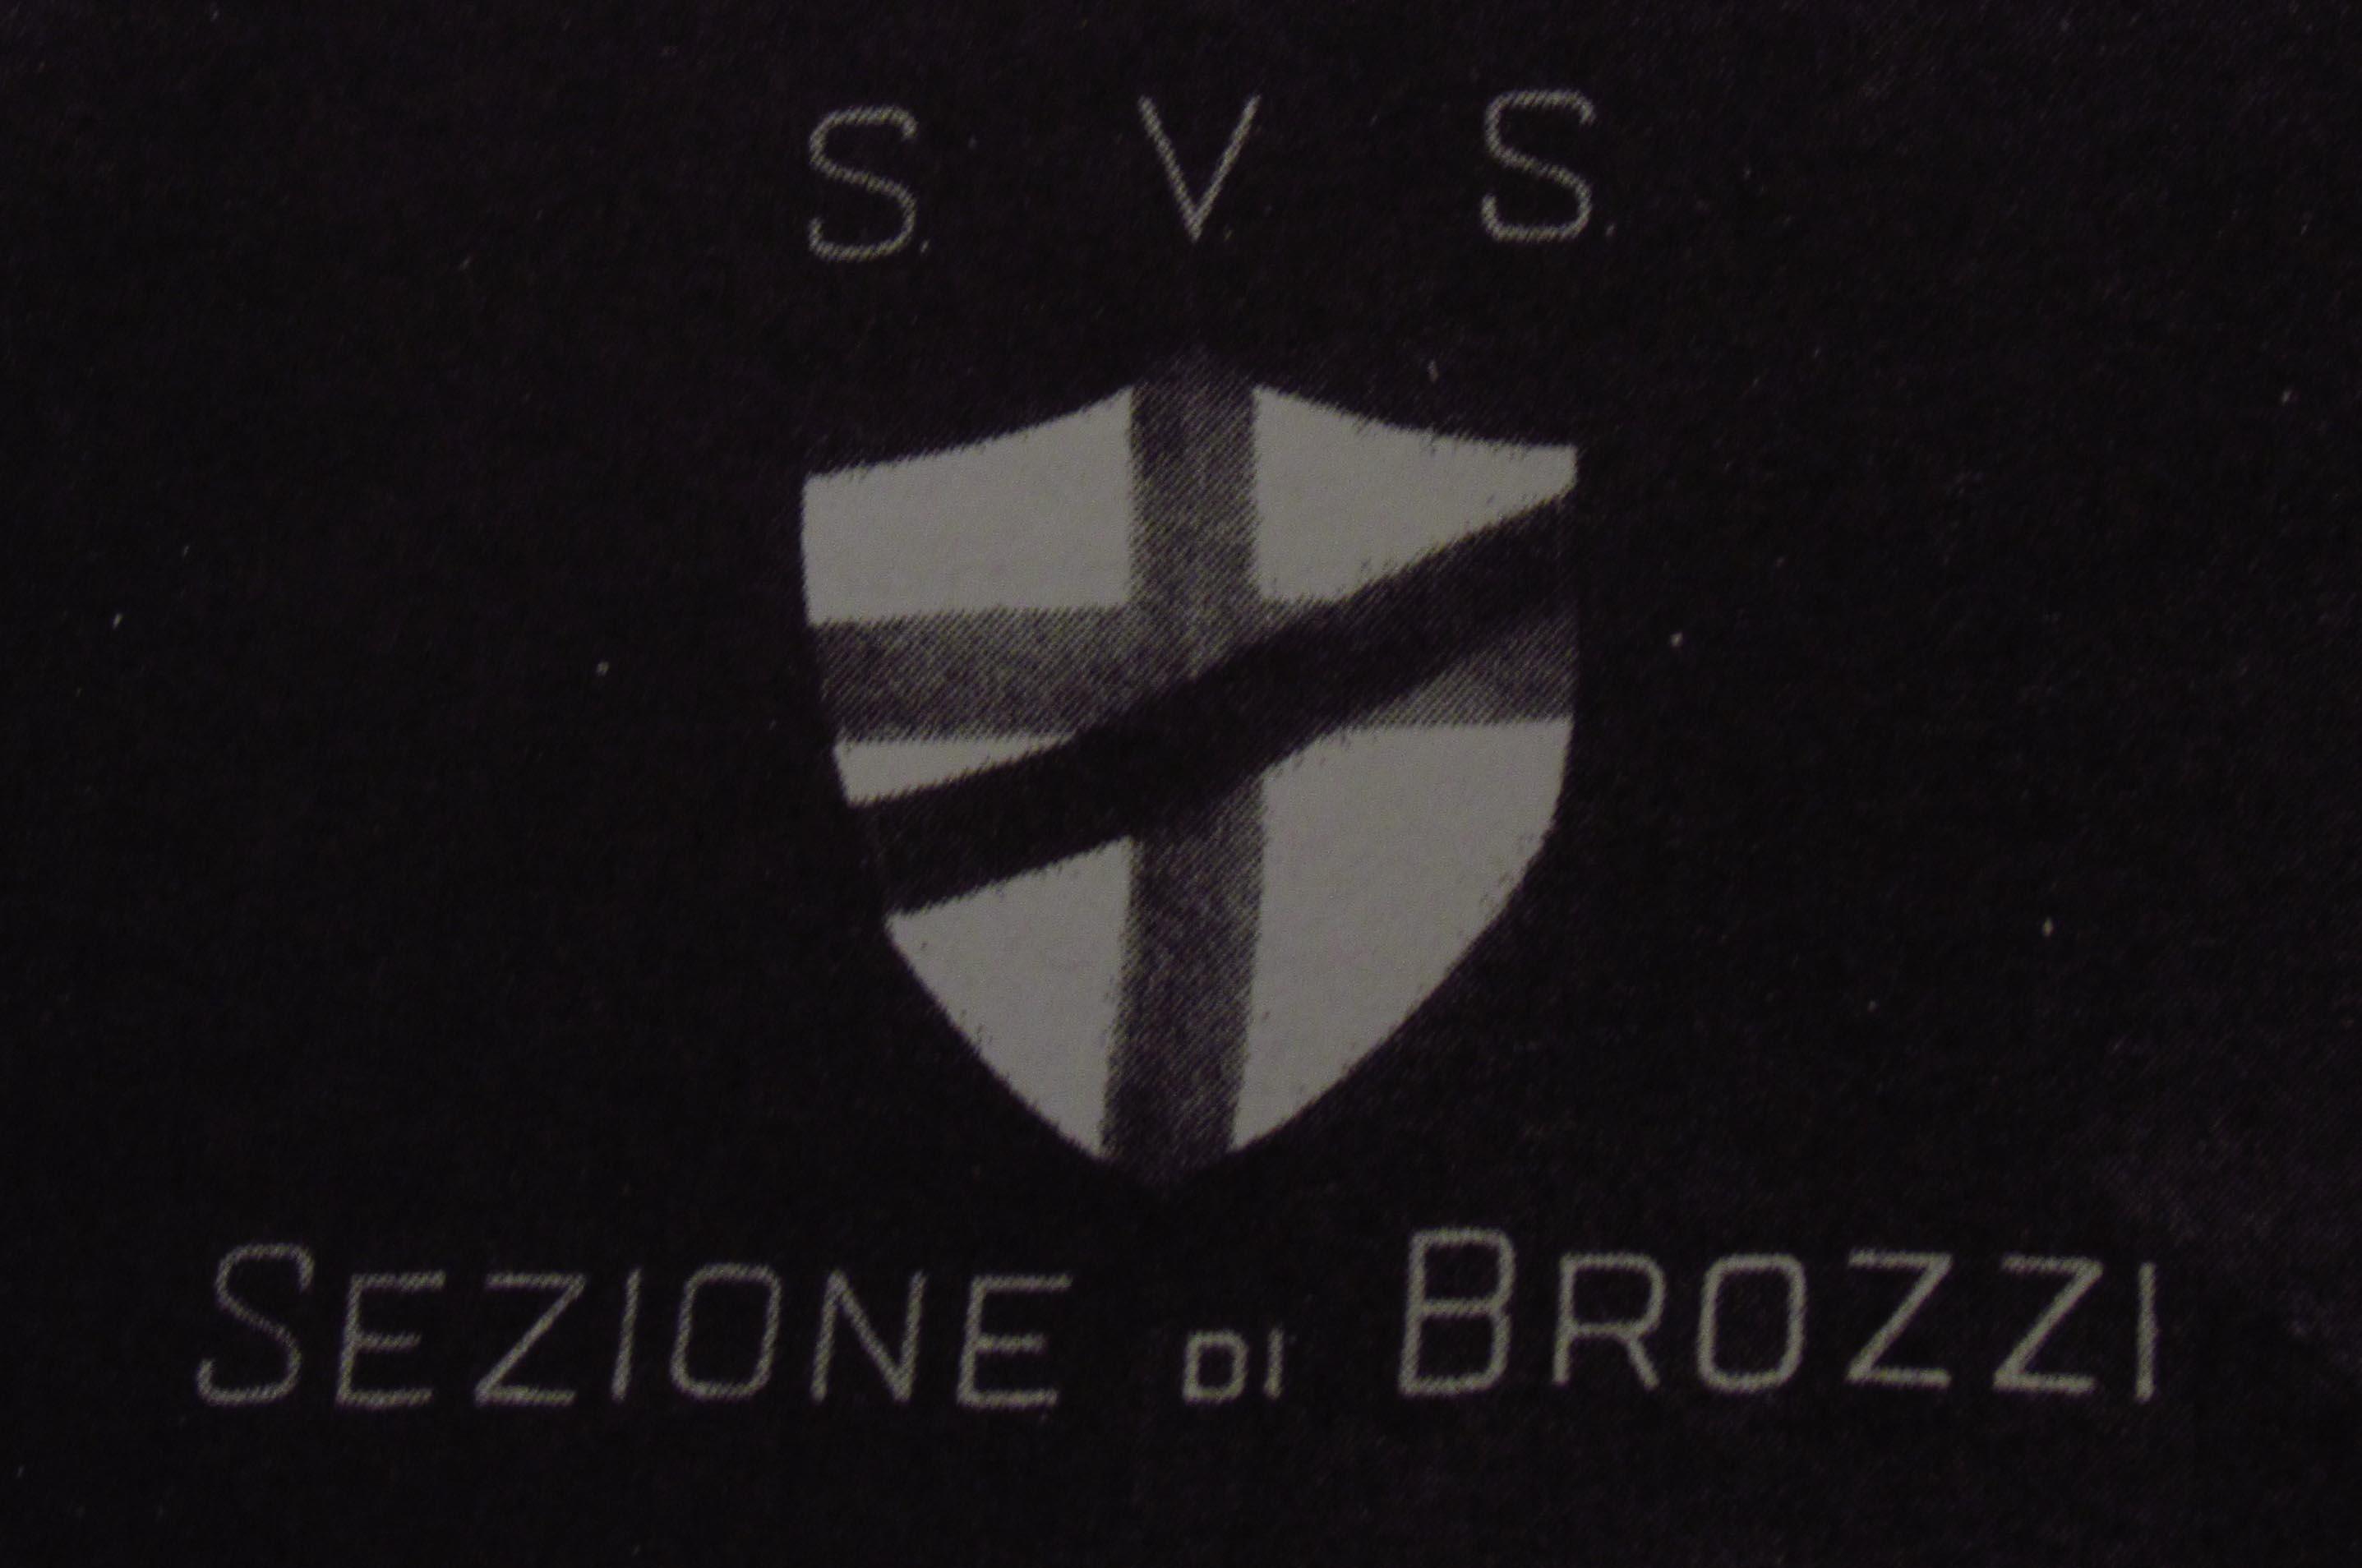 Svs flag